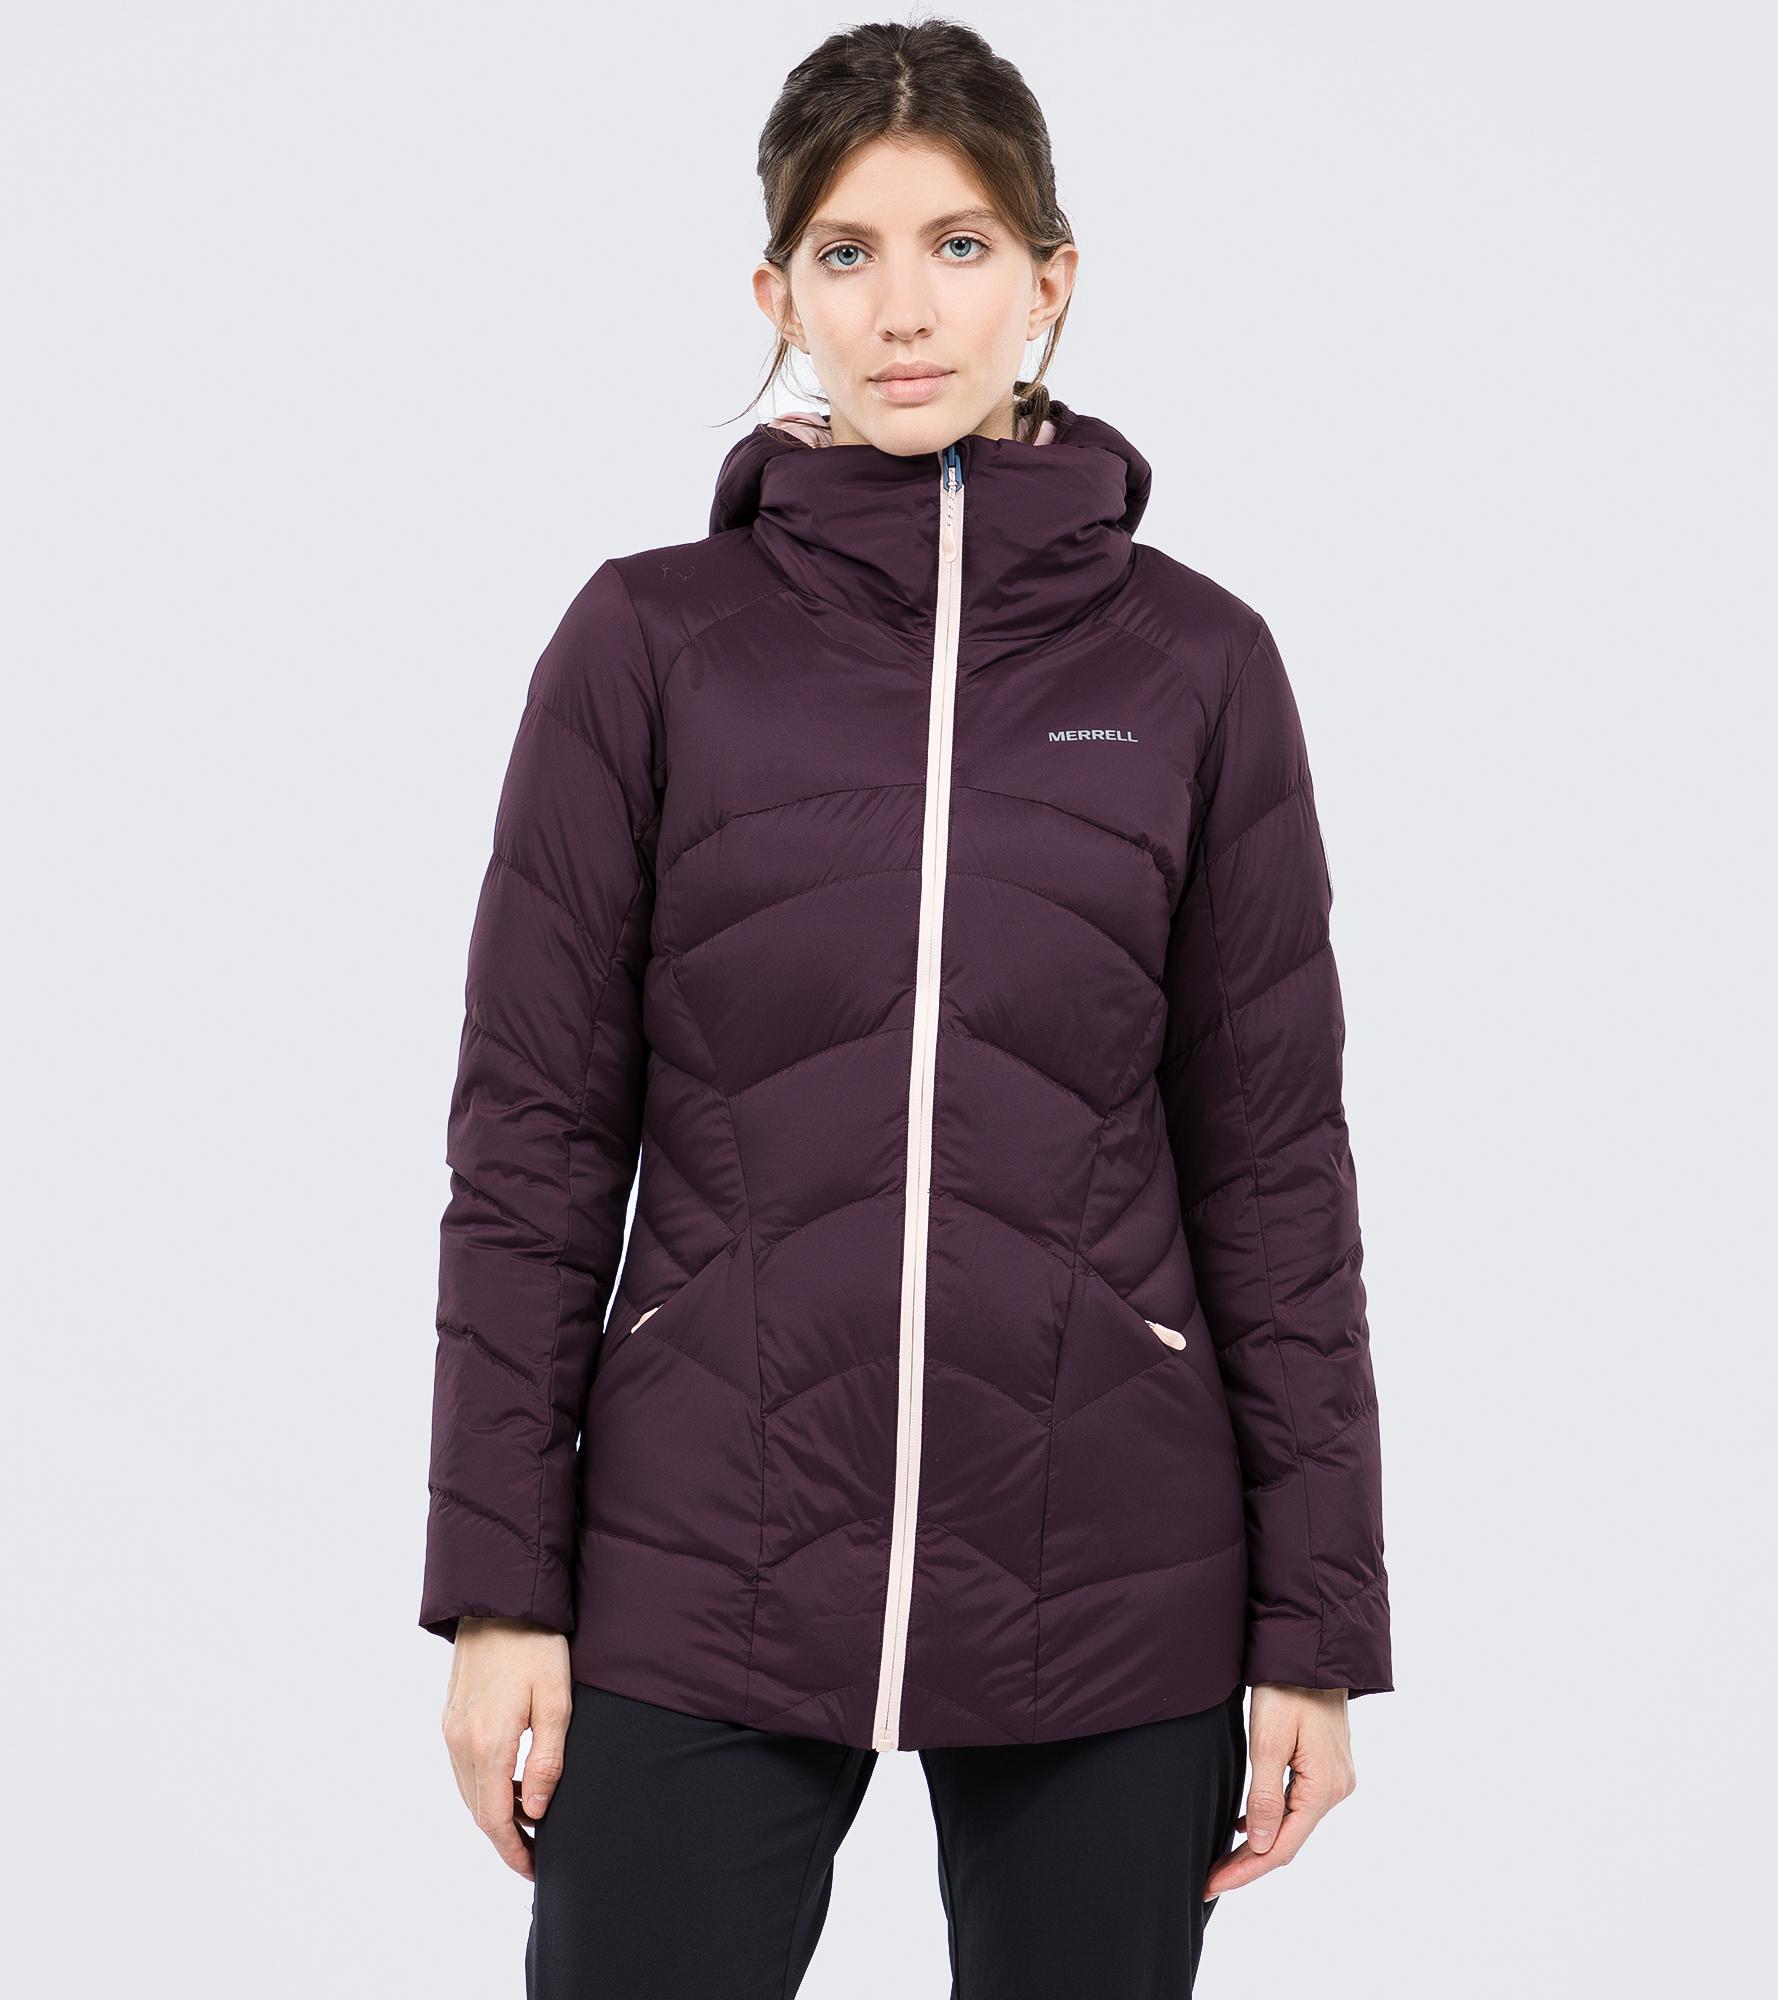 цена Merrell Куртка пуховая женская Merrell, размер 50 онлайн в 2017 году